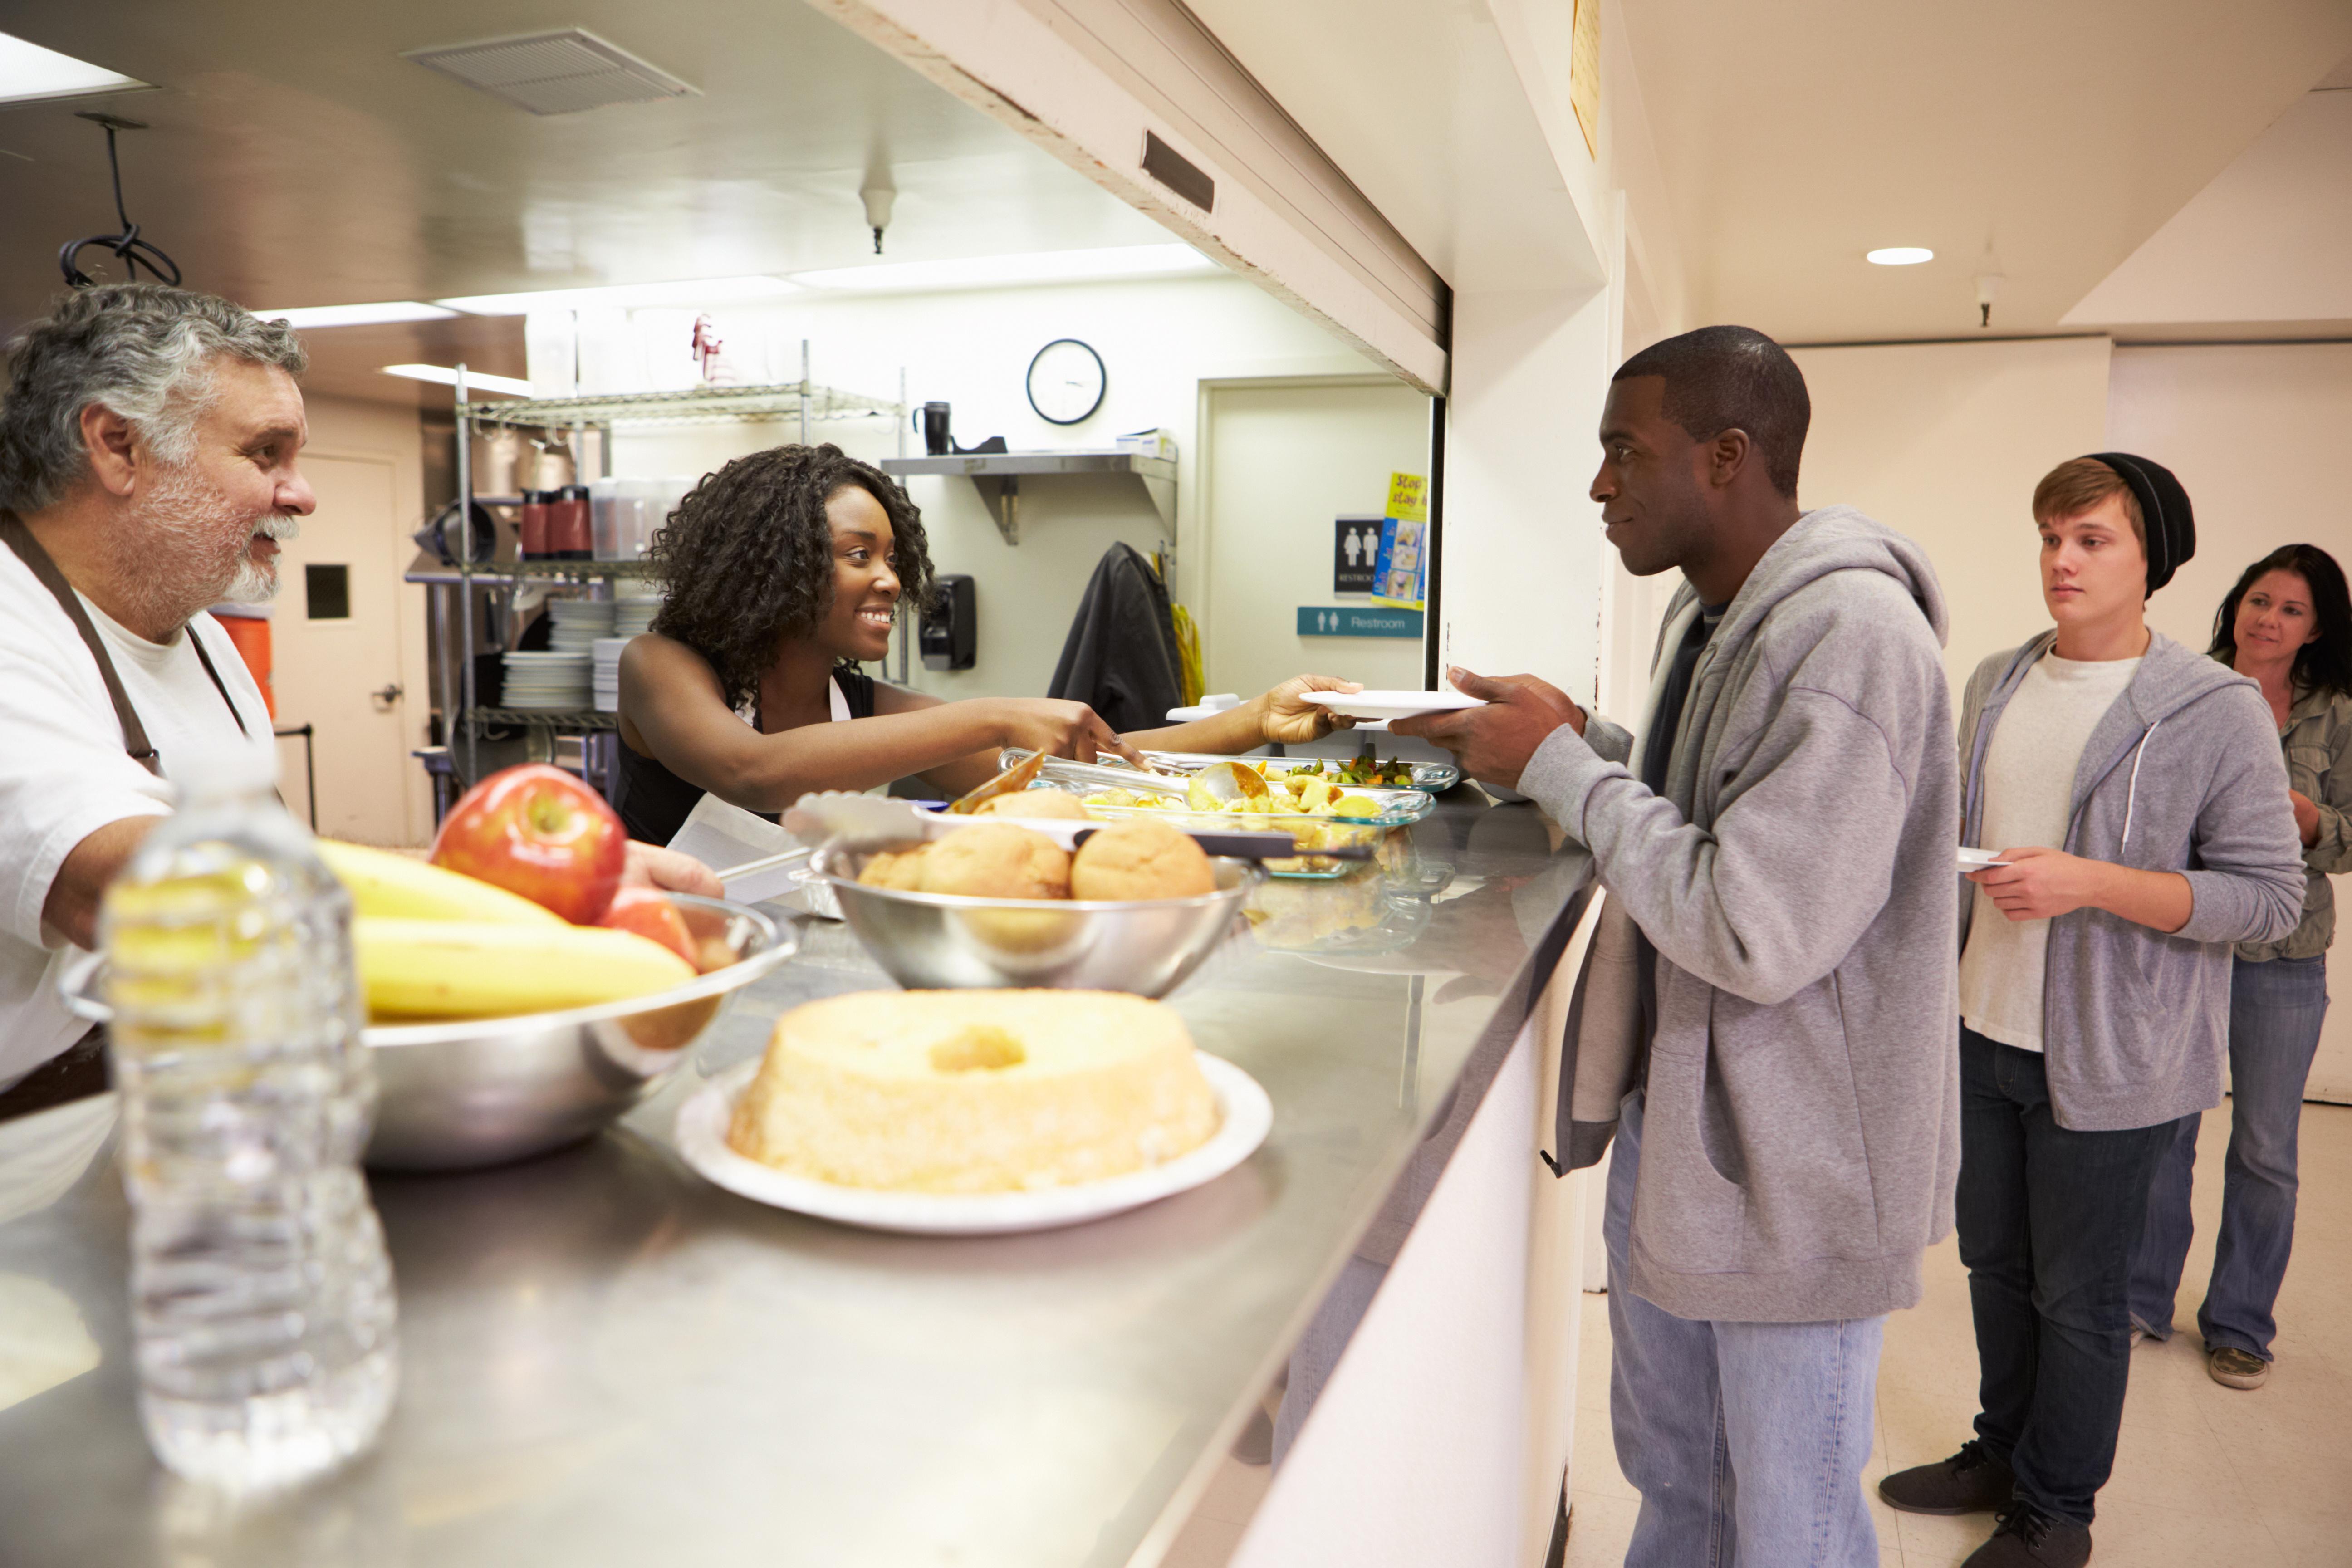 Soup kitchen, homeless shelter, volunteer